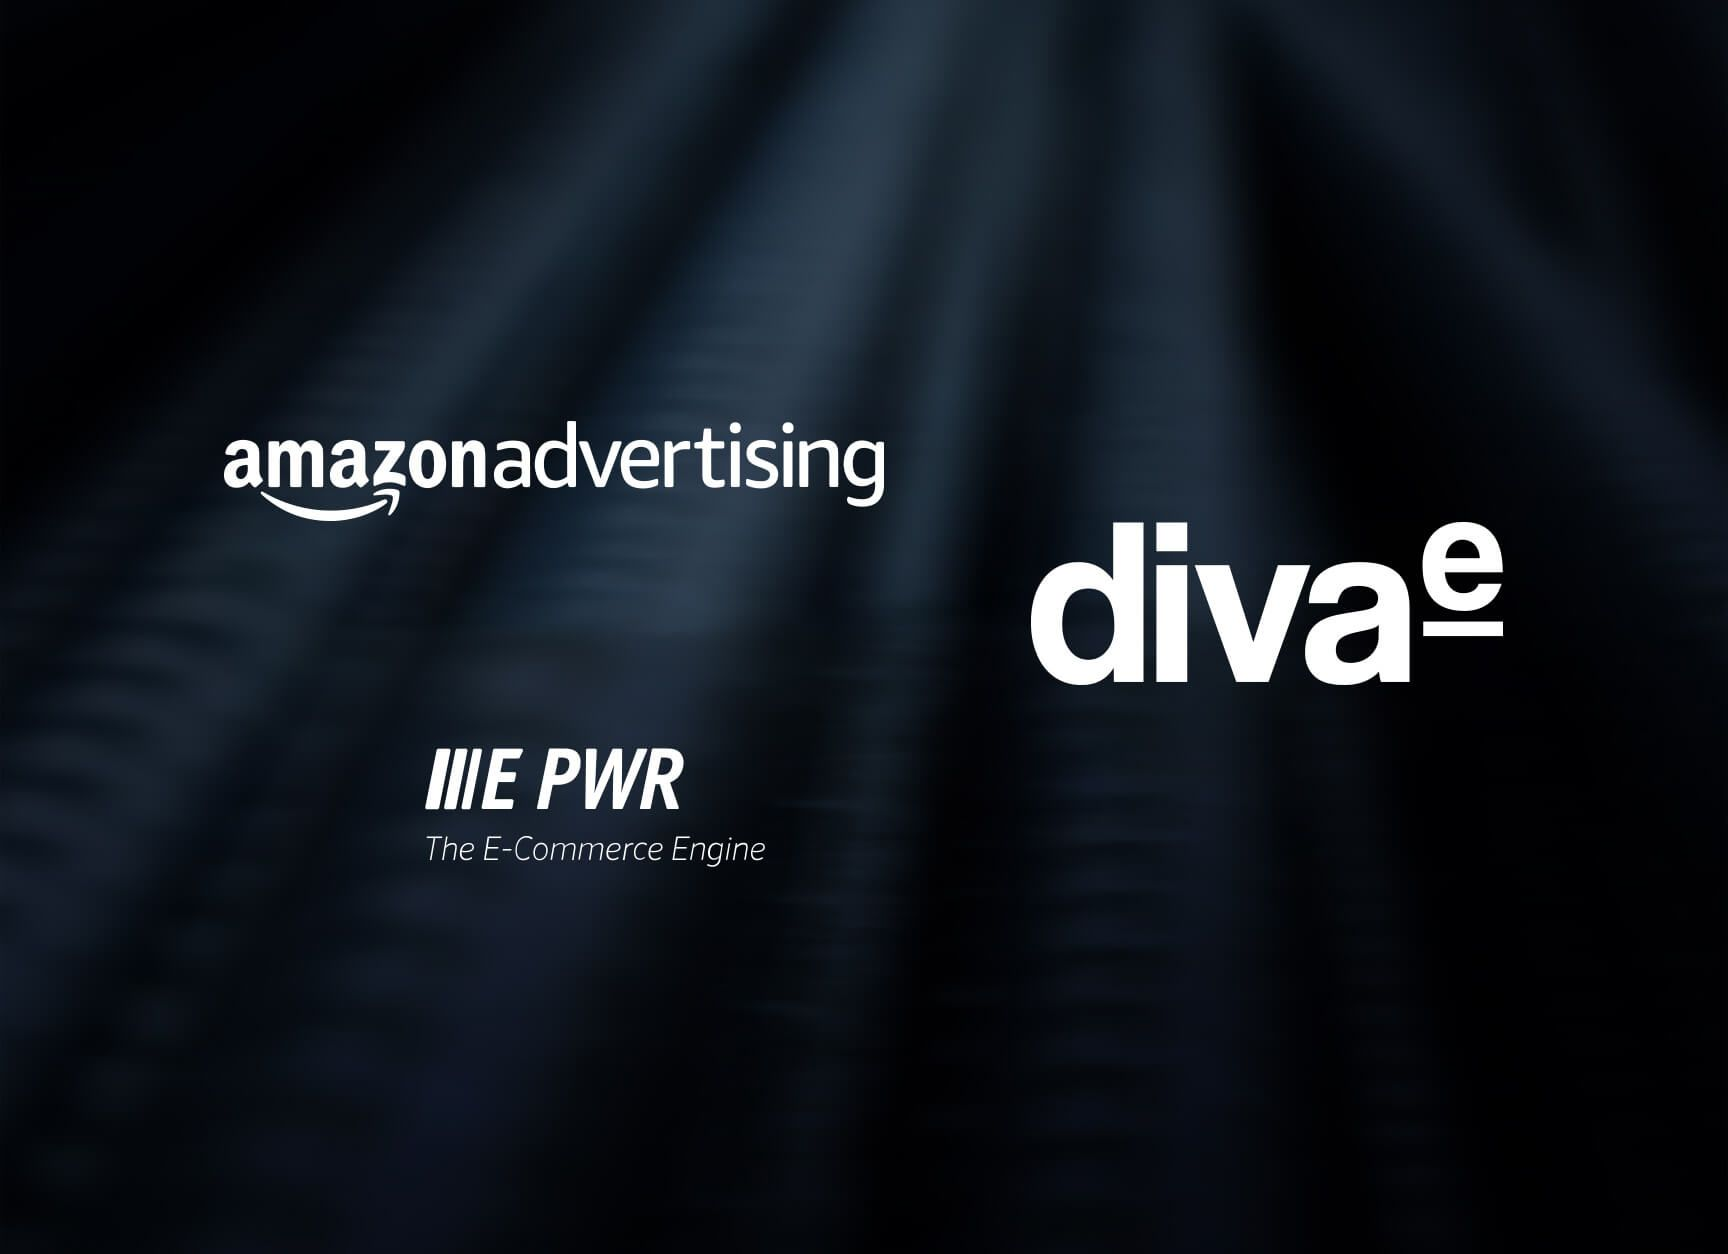 diva-e Marke E PWR ist Amazon Advertising Partner